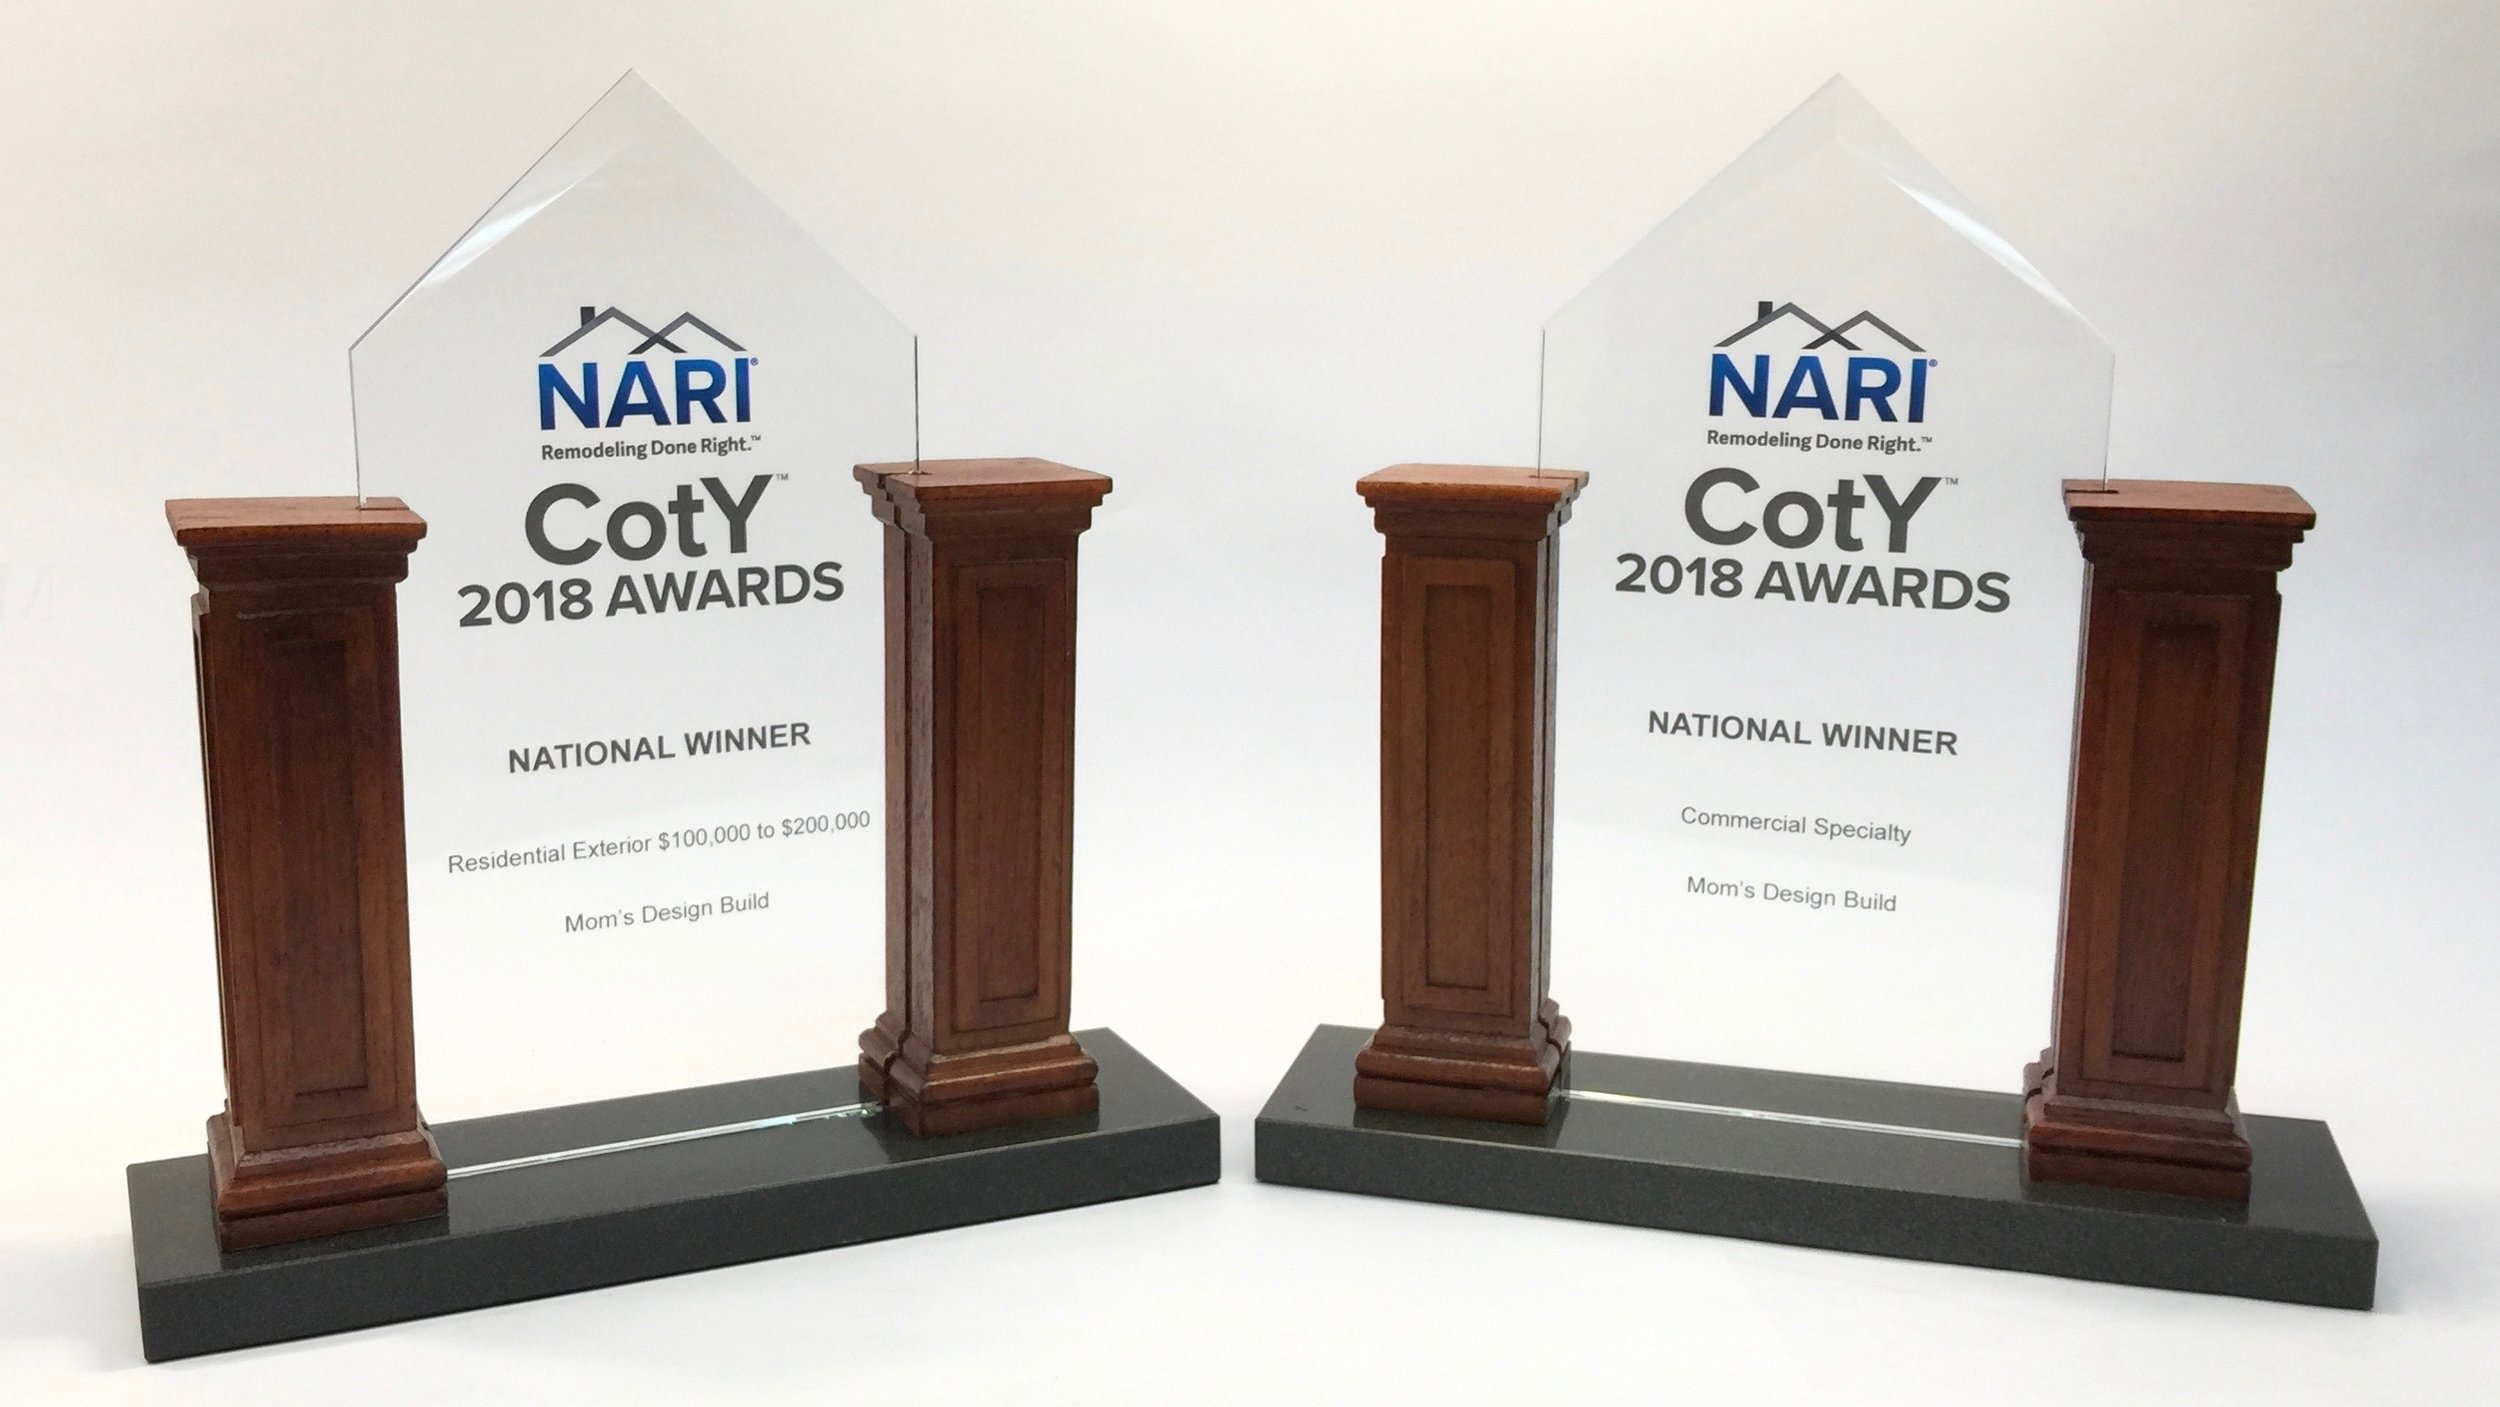 Mom's Design Build - Two National NARI CotY Awards